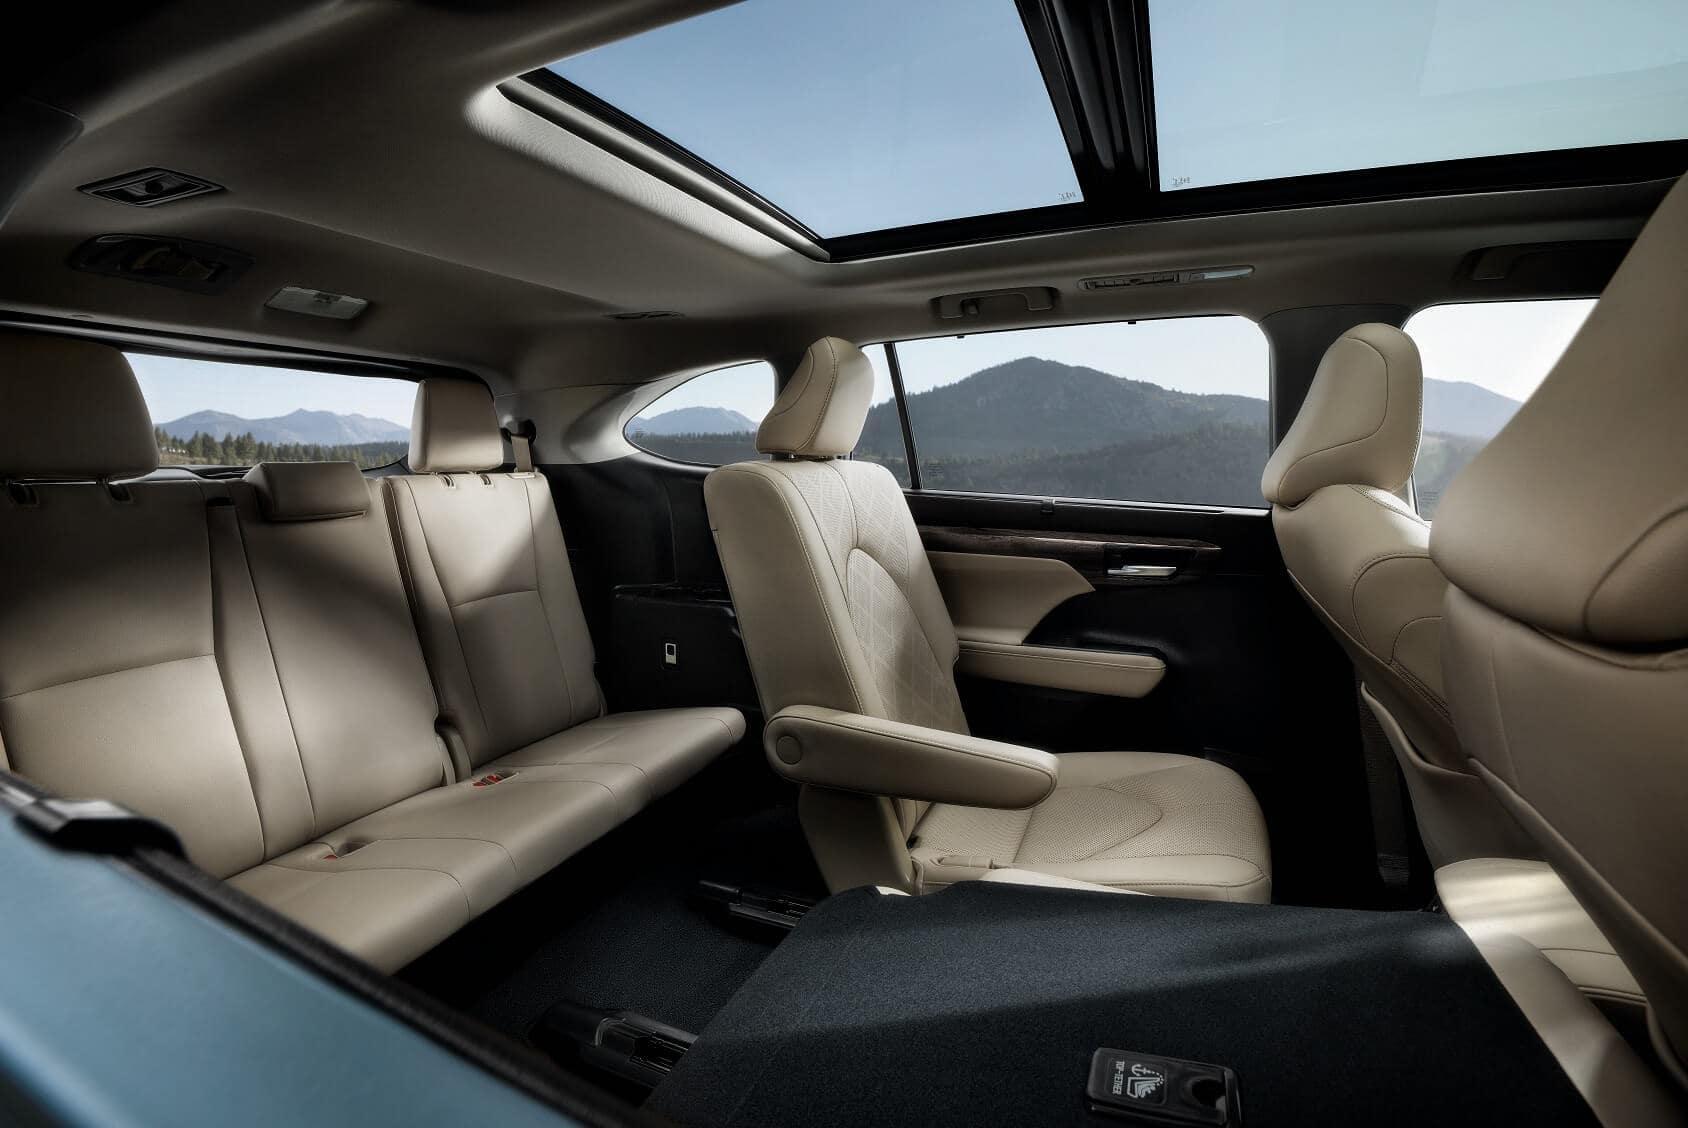 Toyota Highlander Interior Space